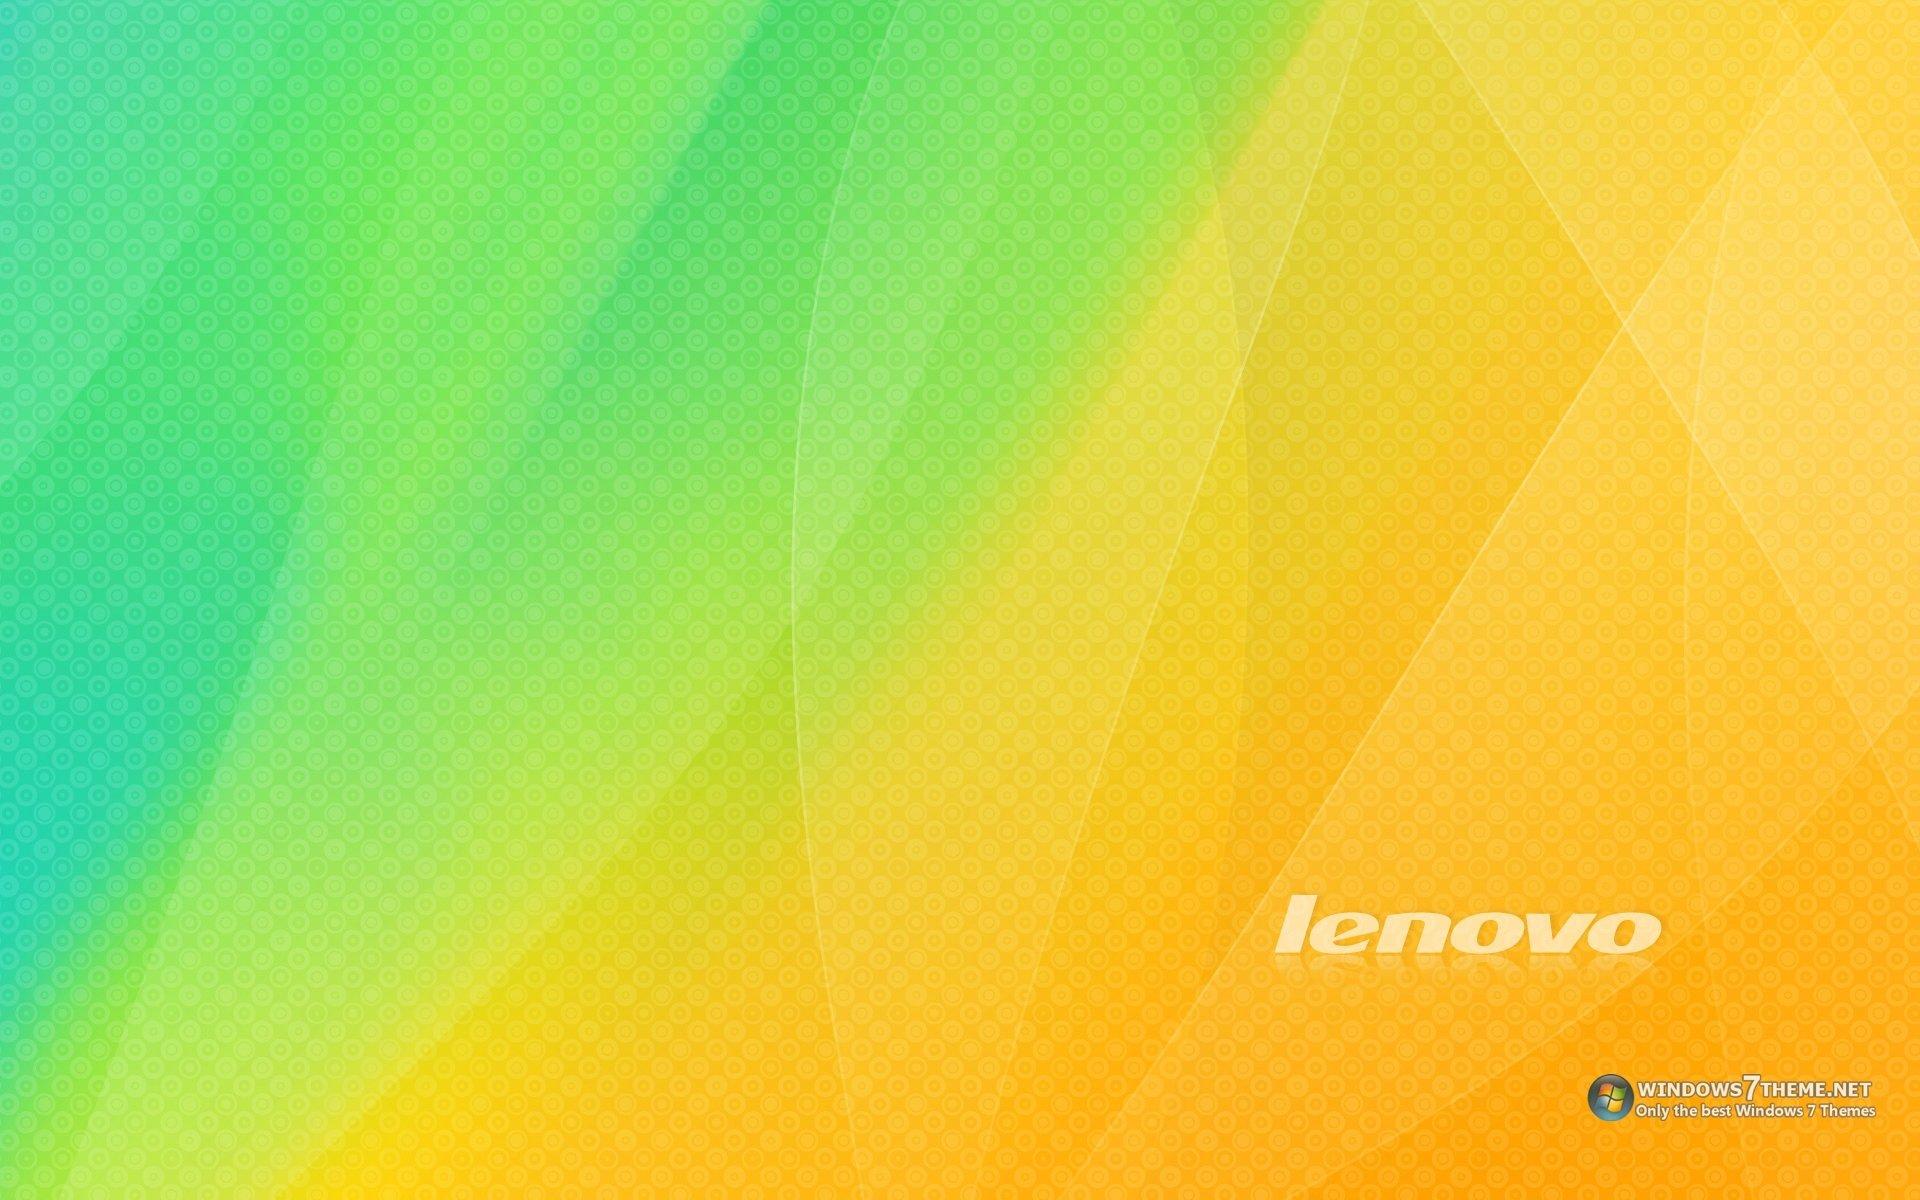 LENOVO computer wallpaper | 1920x1200 | 421201 | WallpaperUP